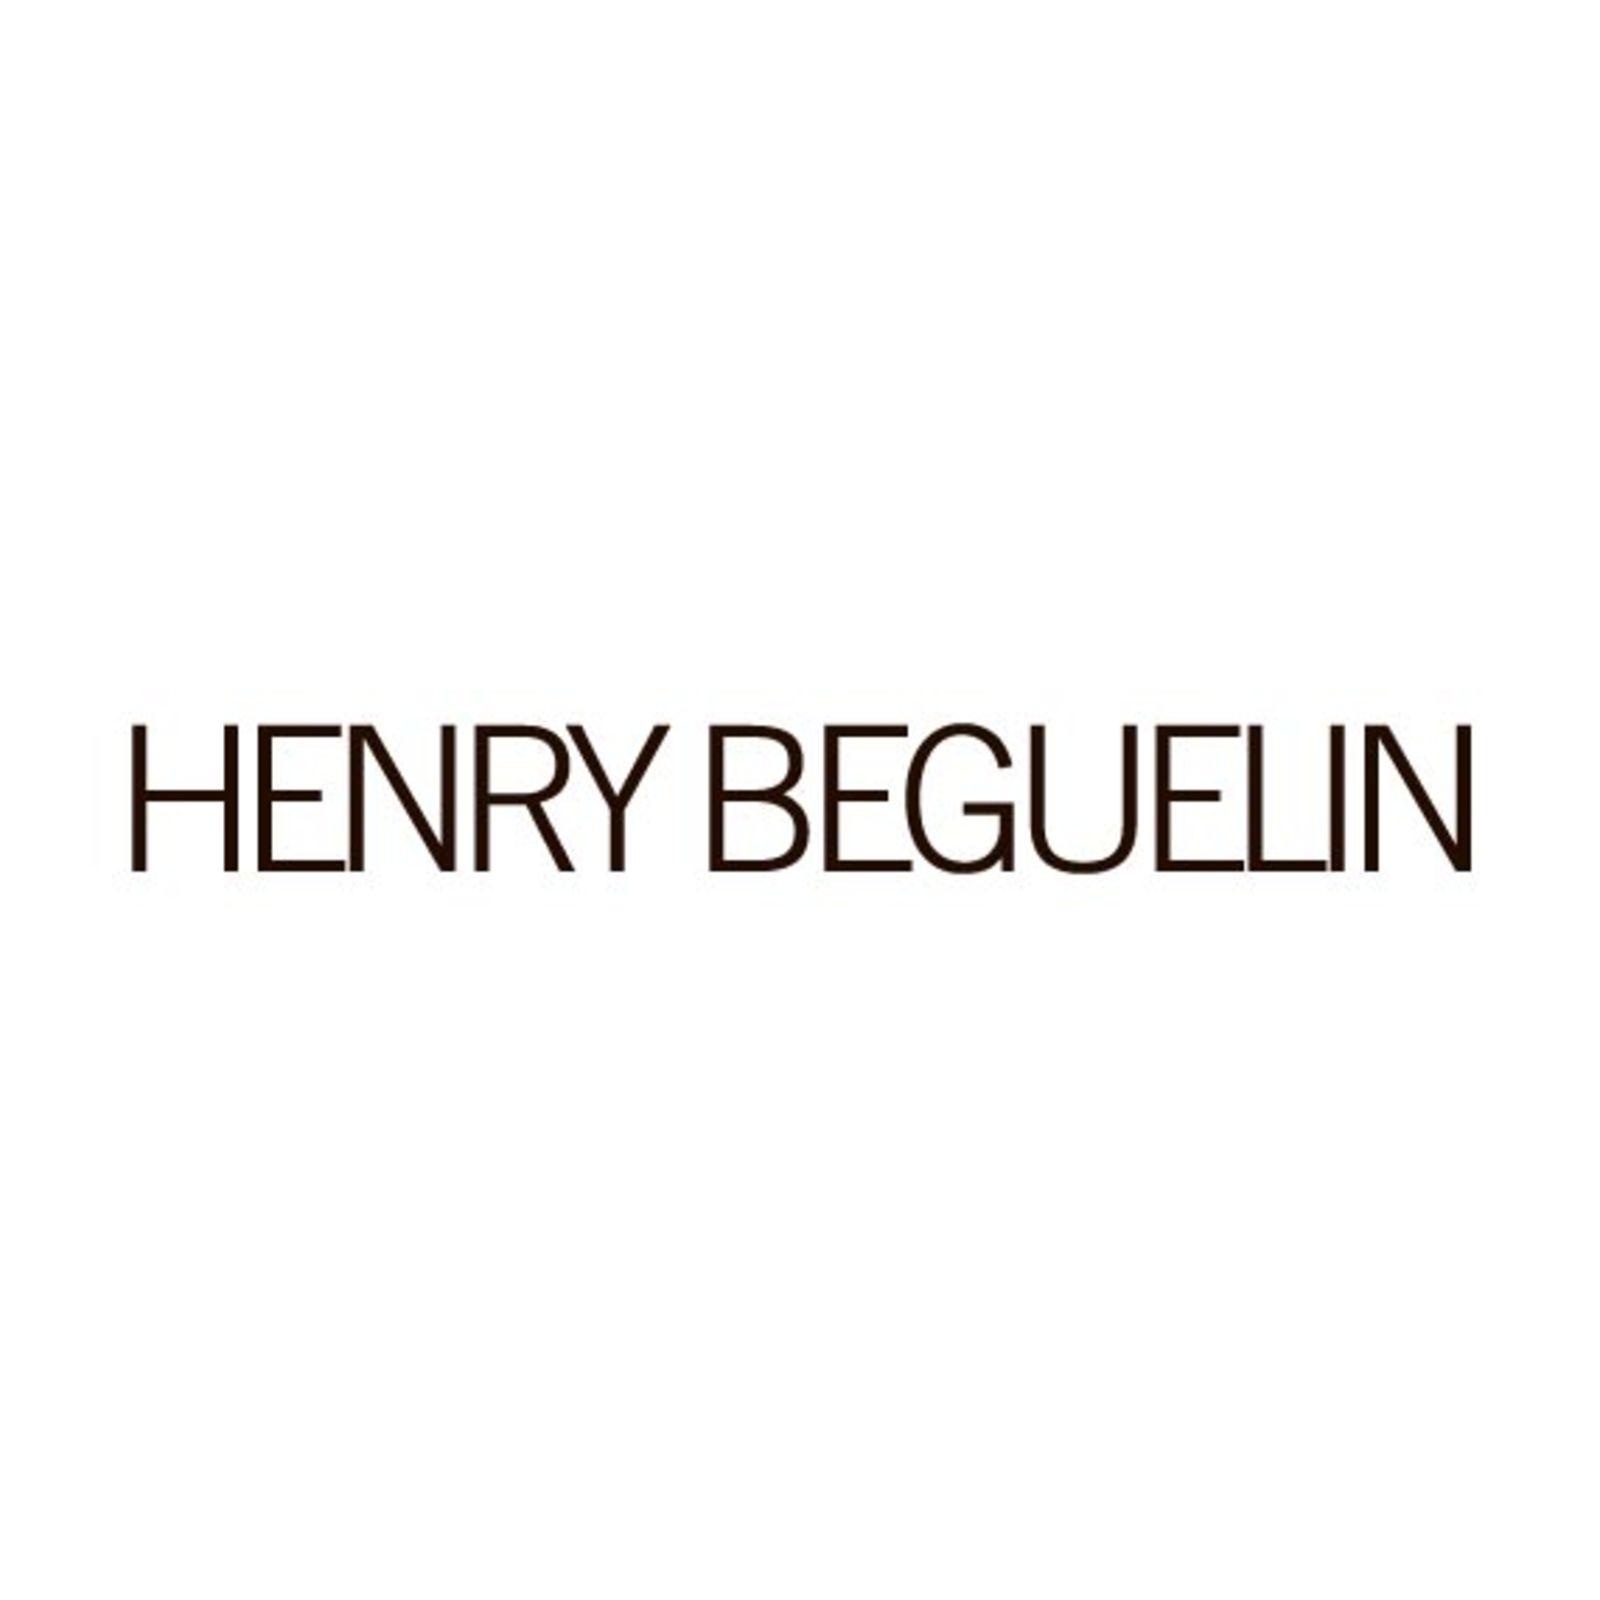 HENRY BEGUELIN (Bild 1)